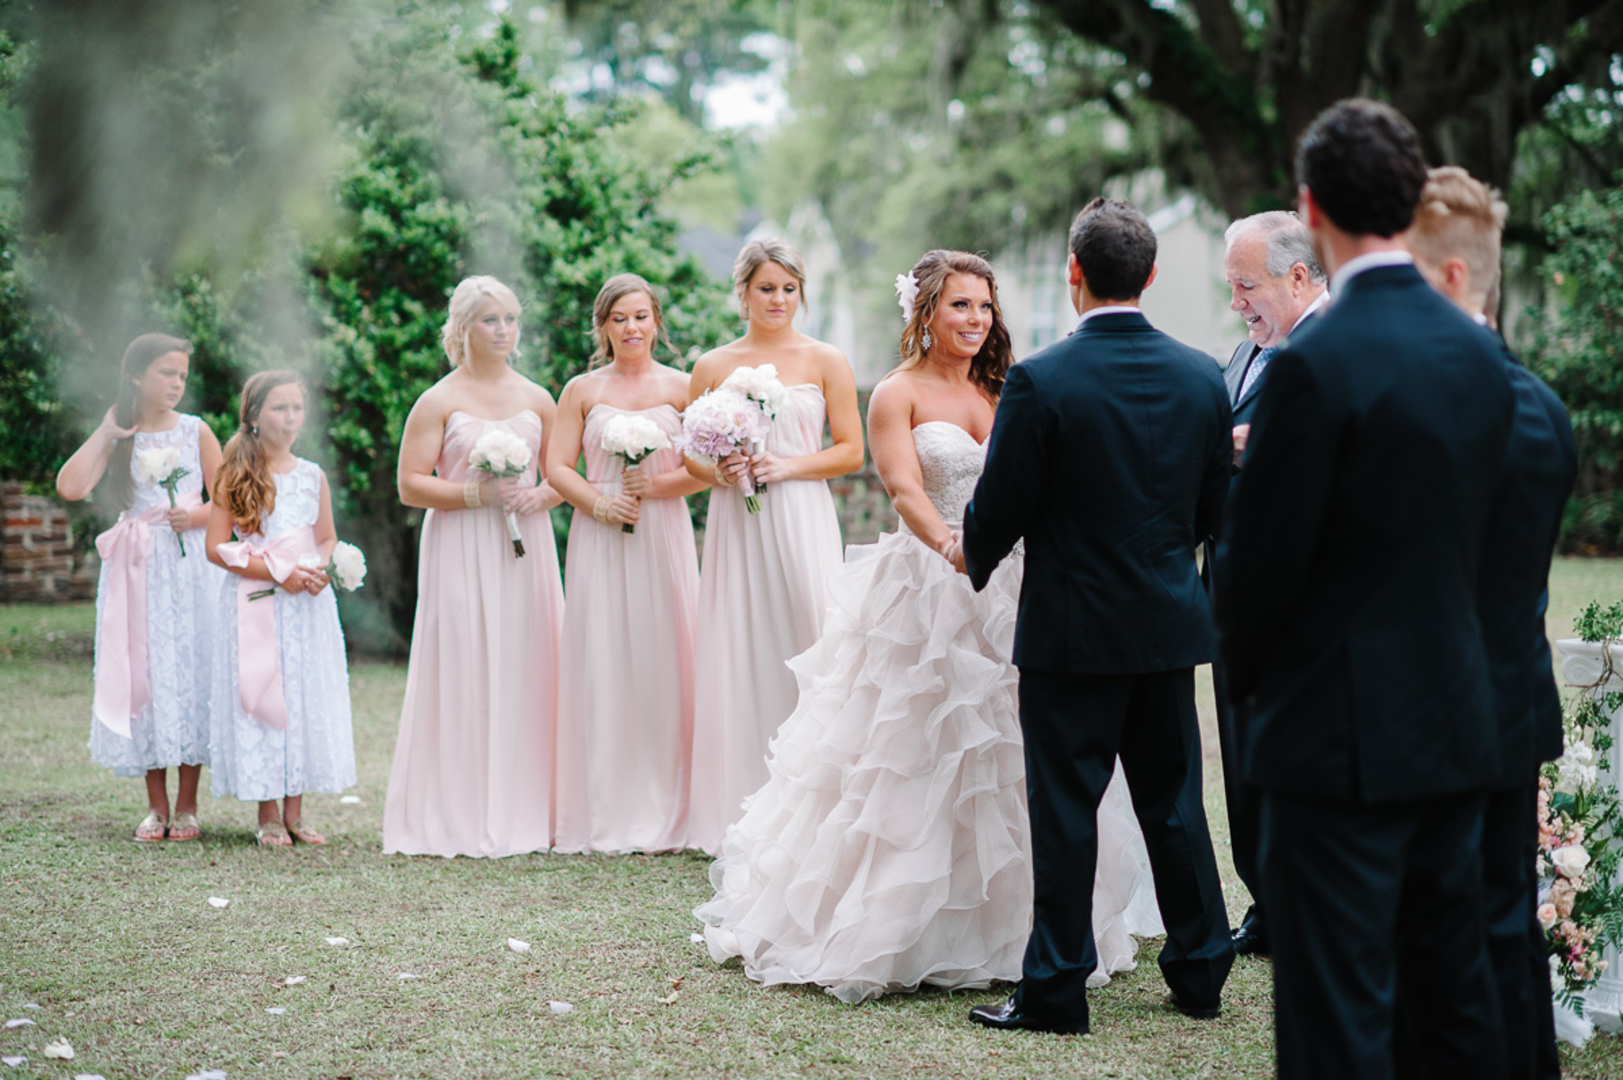 mansfield-plantation-wedding-16.jpg